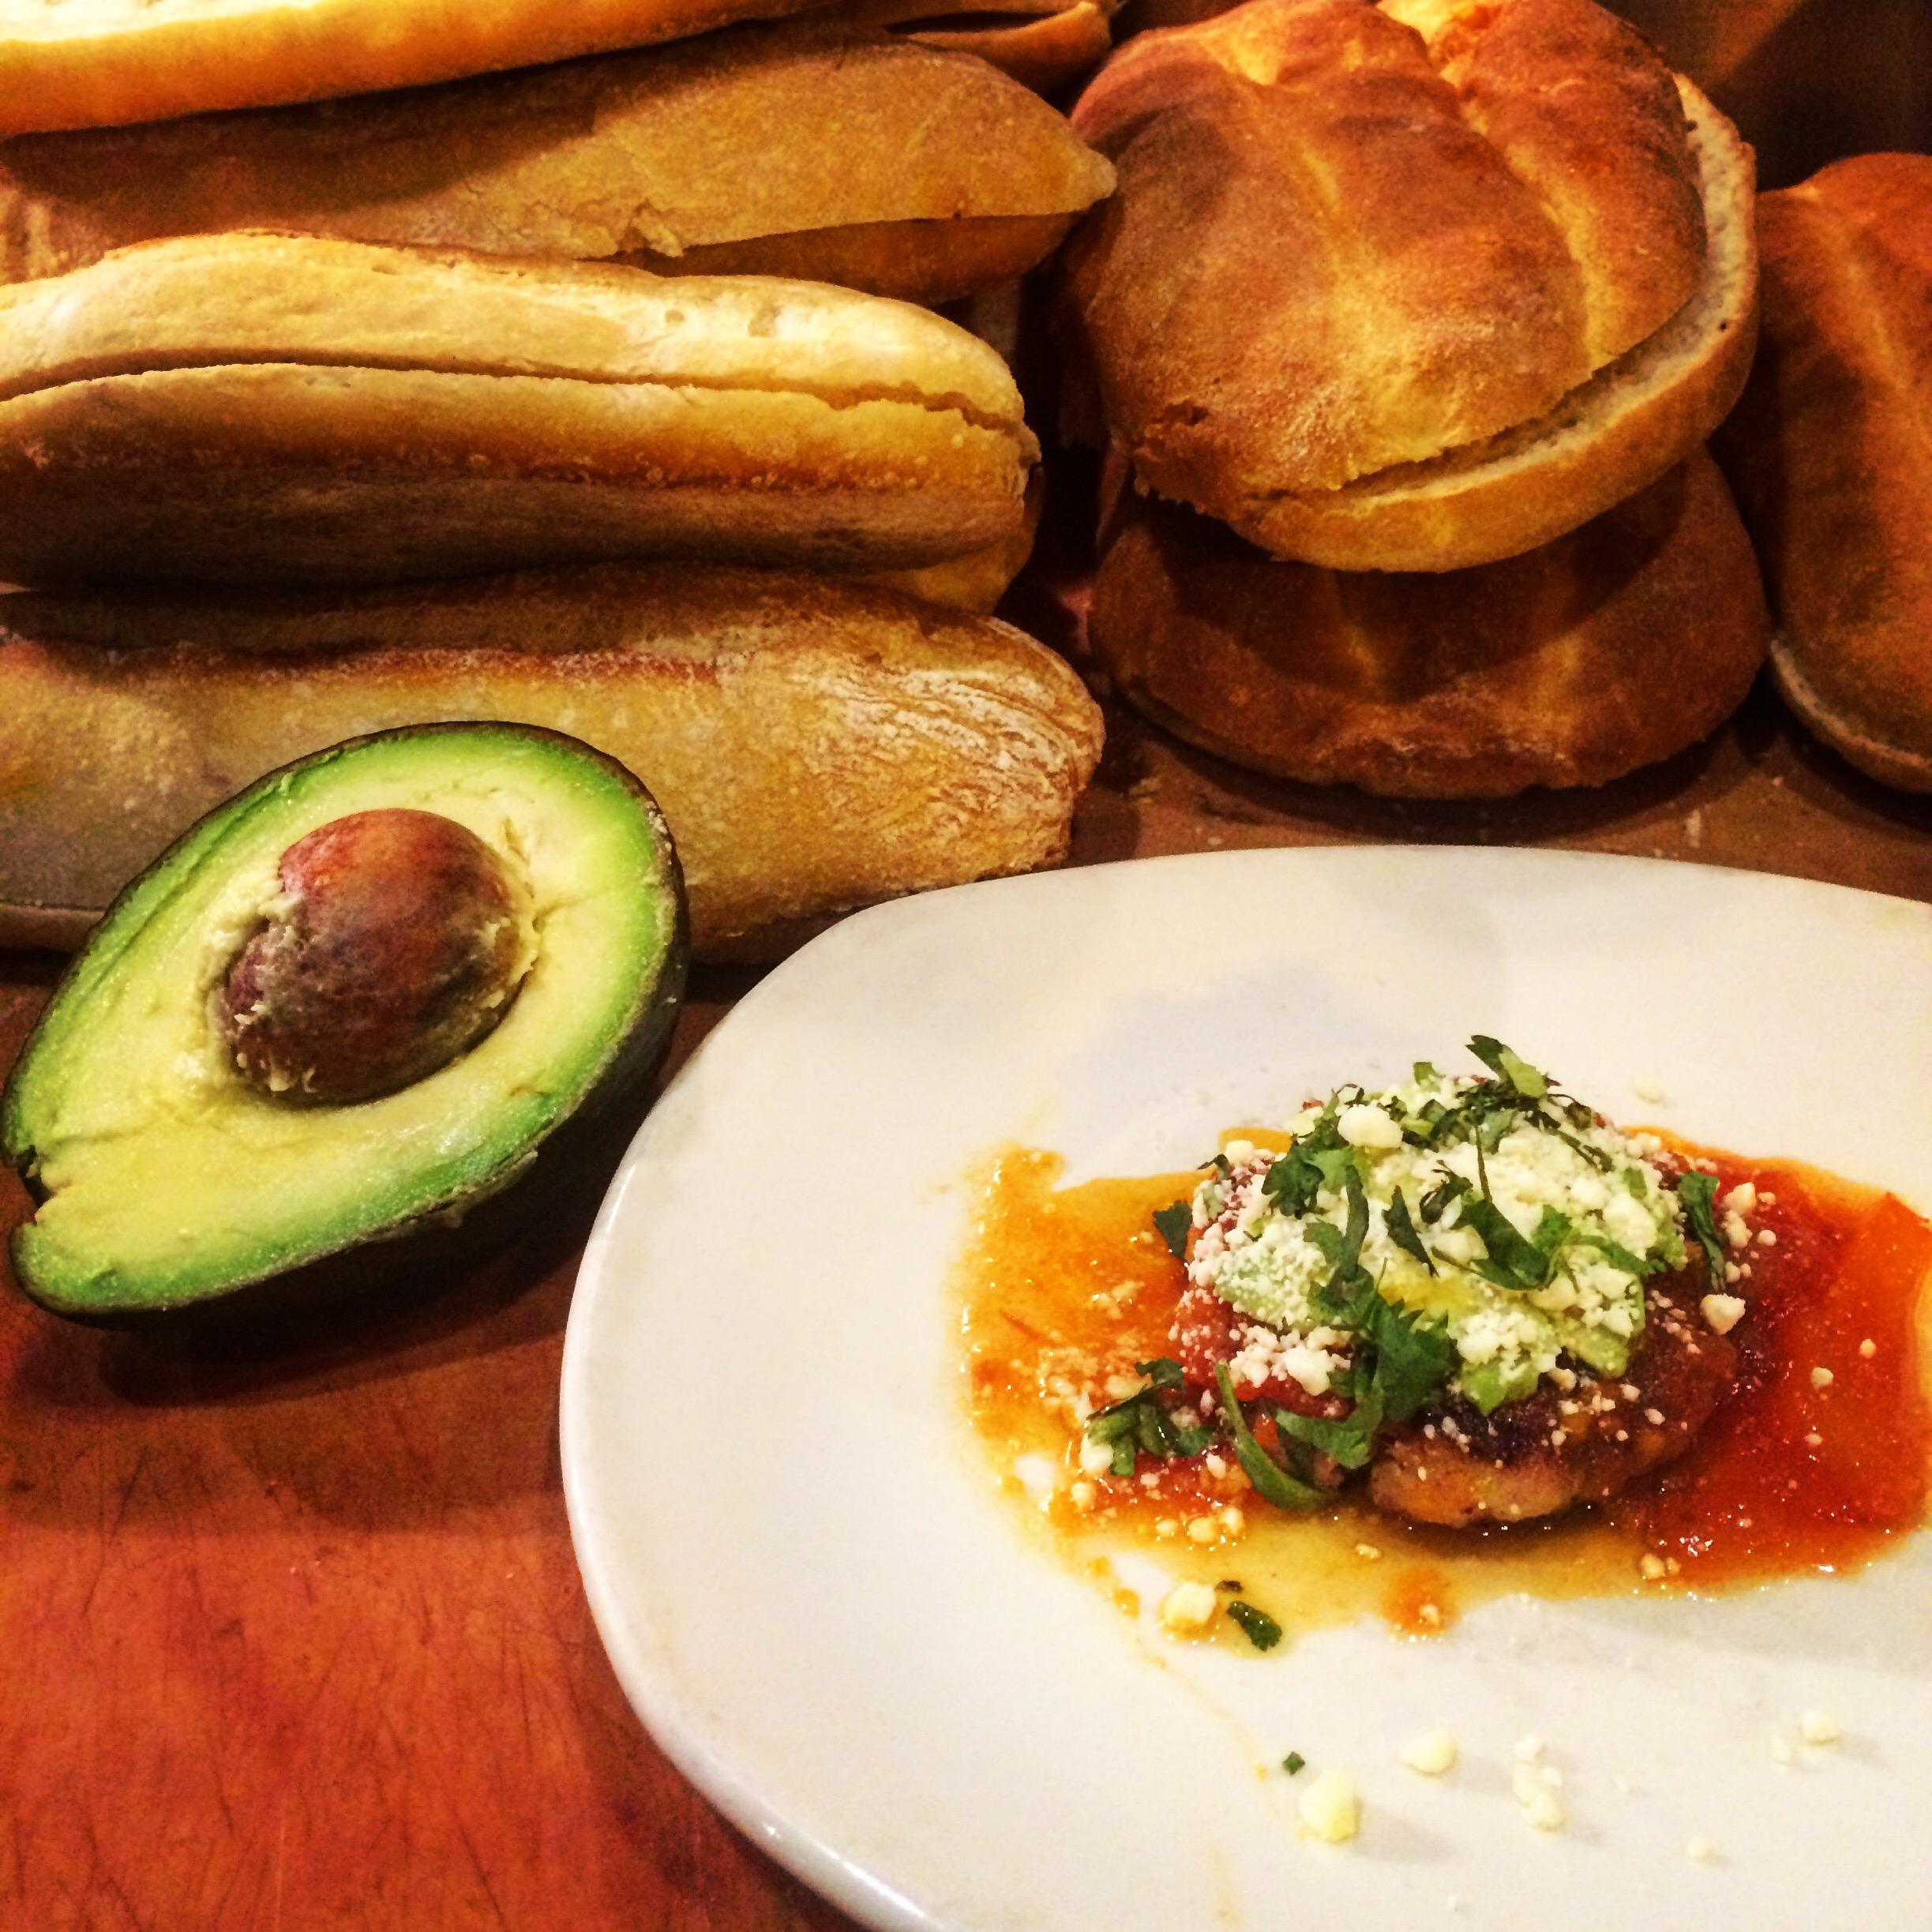 xoco chicago albondiga avocado tomato sauce mexican food tastyspleen quake2 rocketarena ra2 reefer pambazo